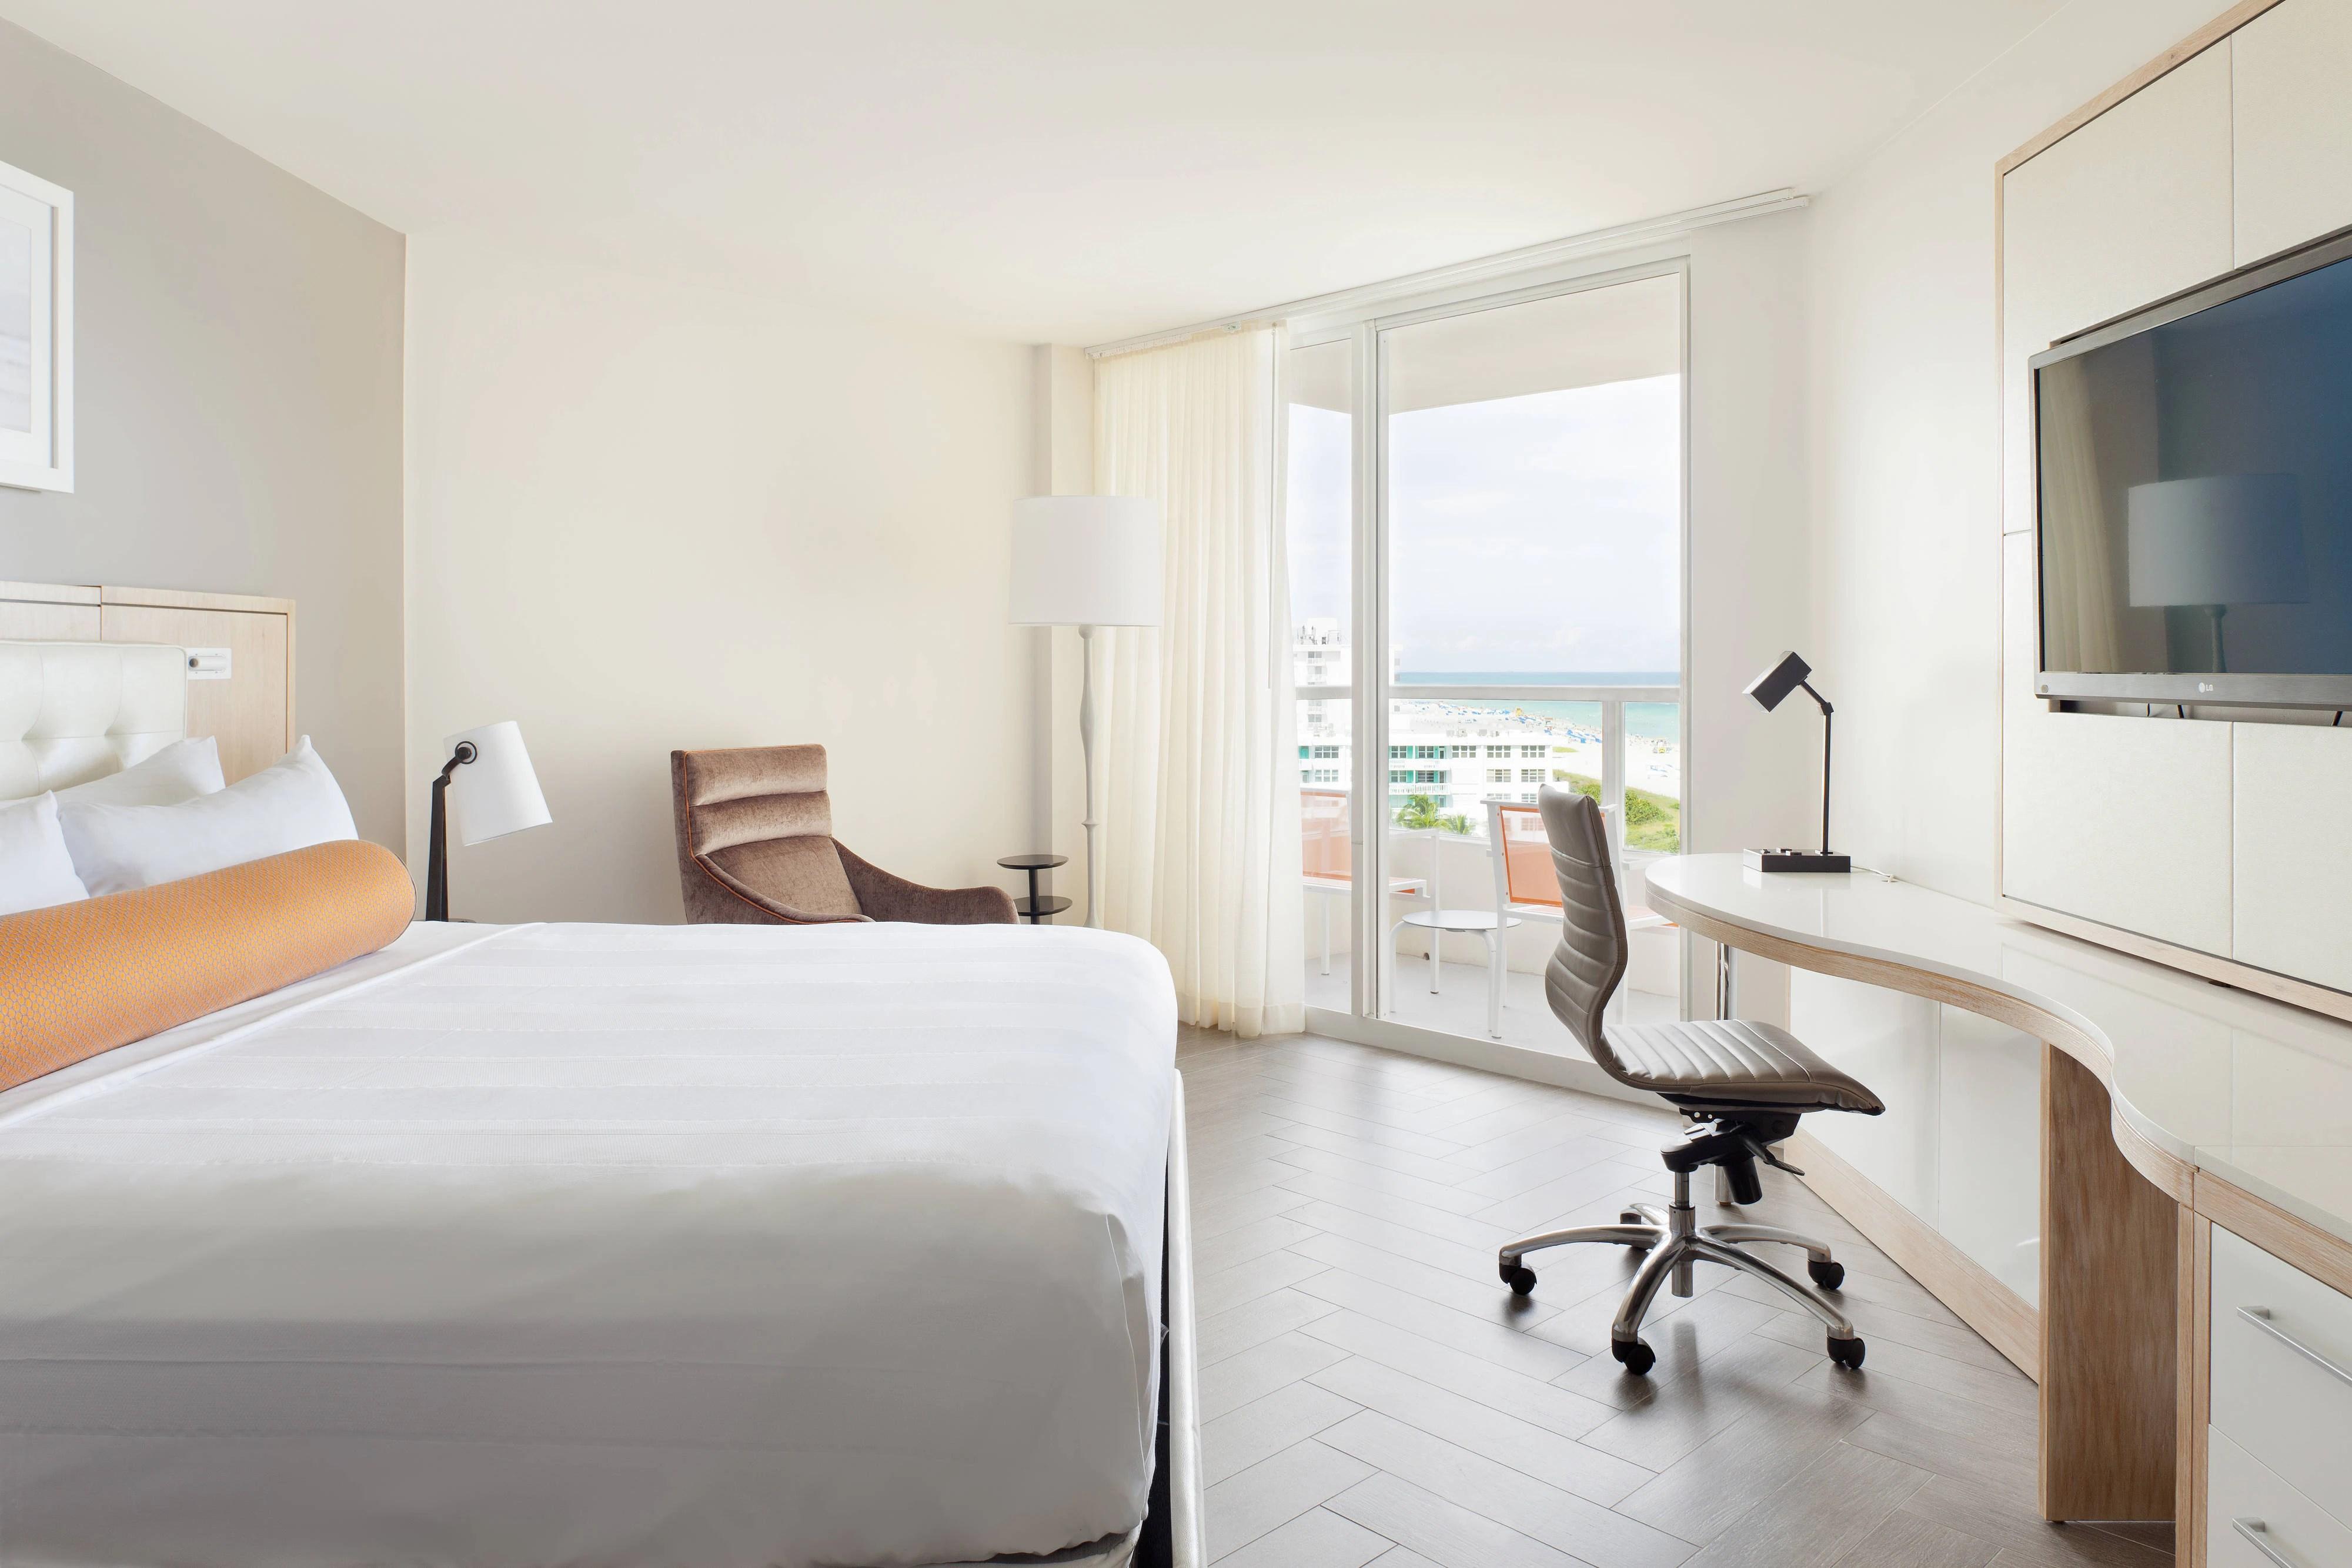 Stanton South Beach Marriott Rooms